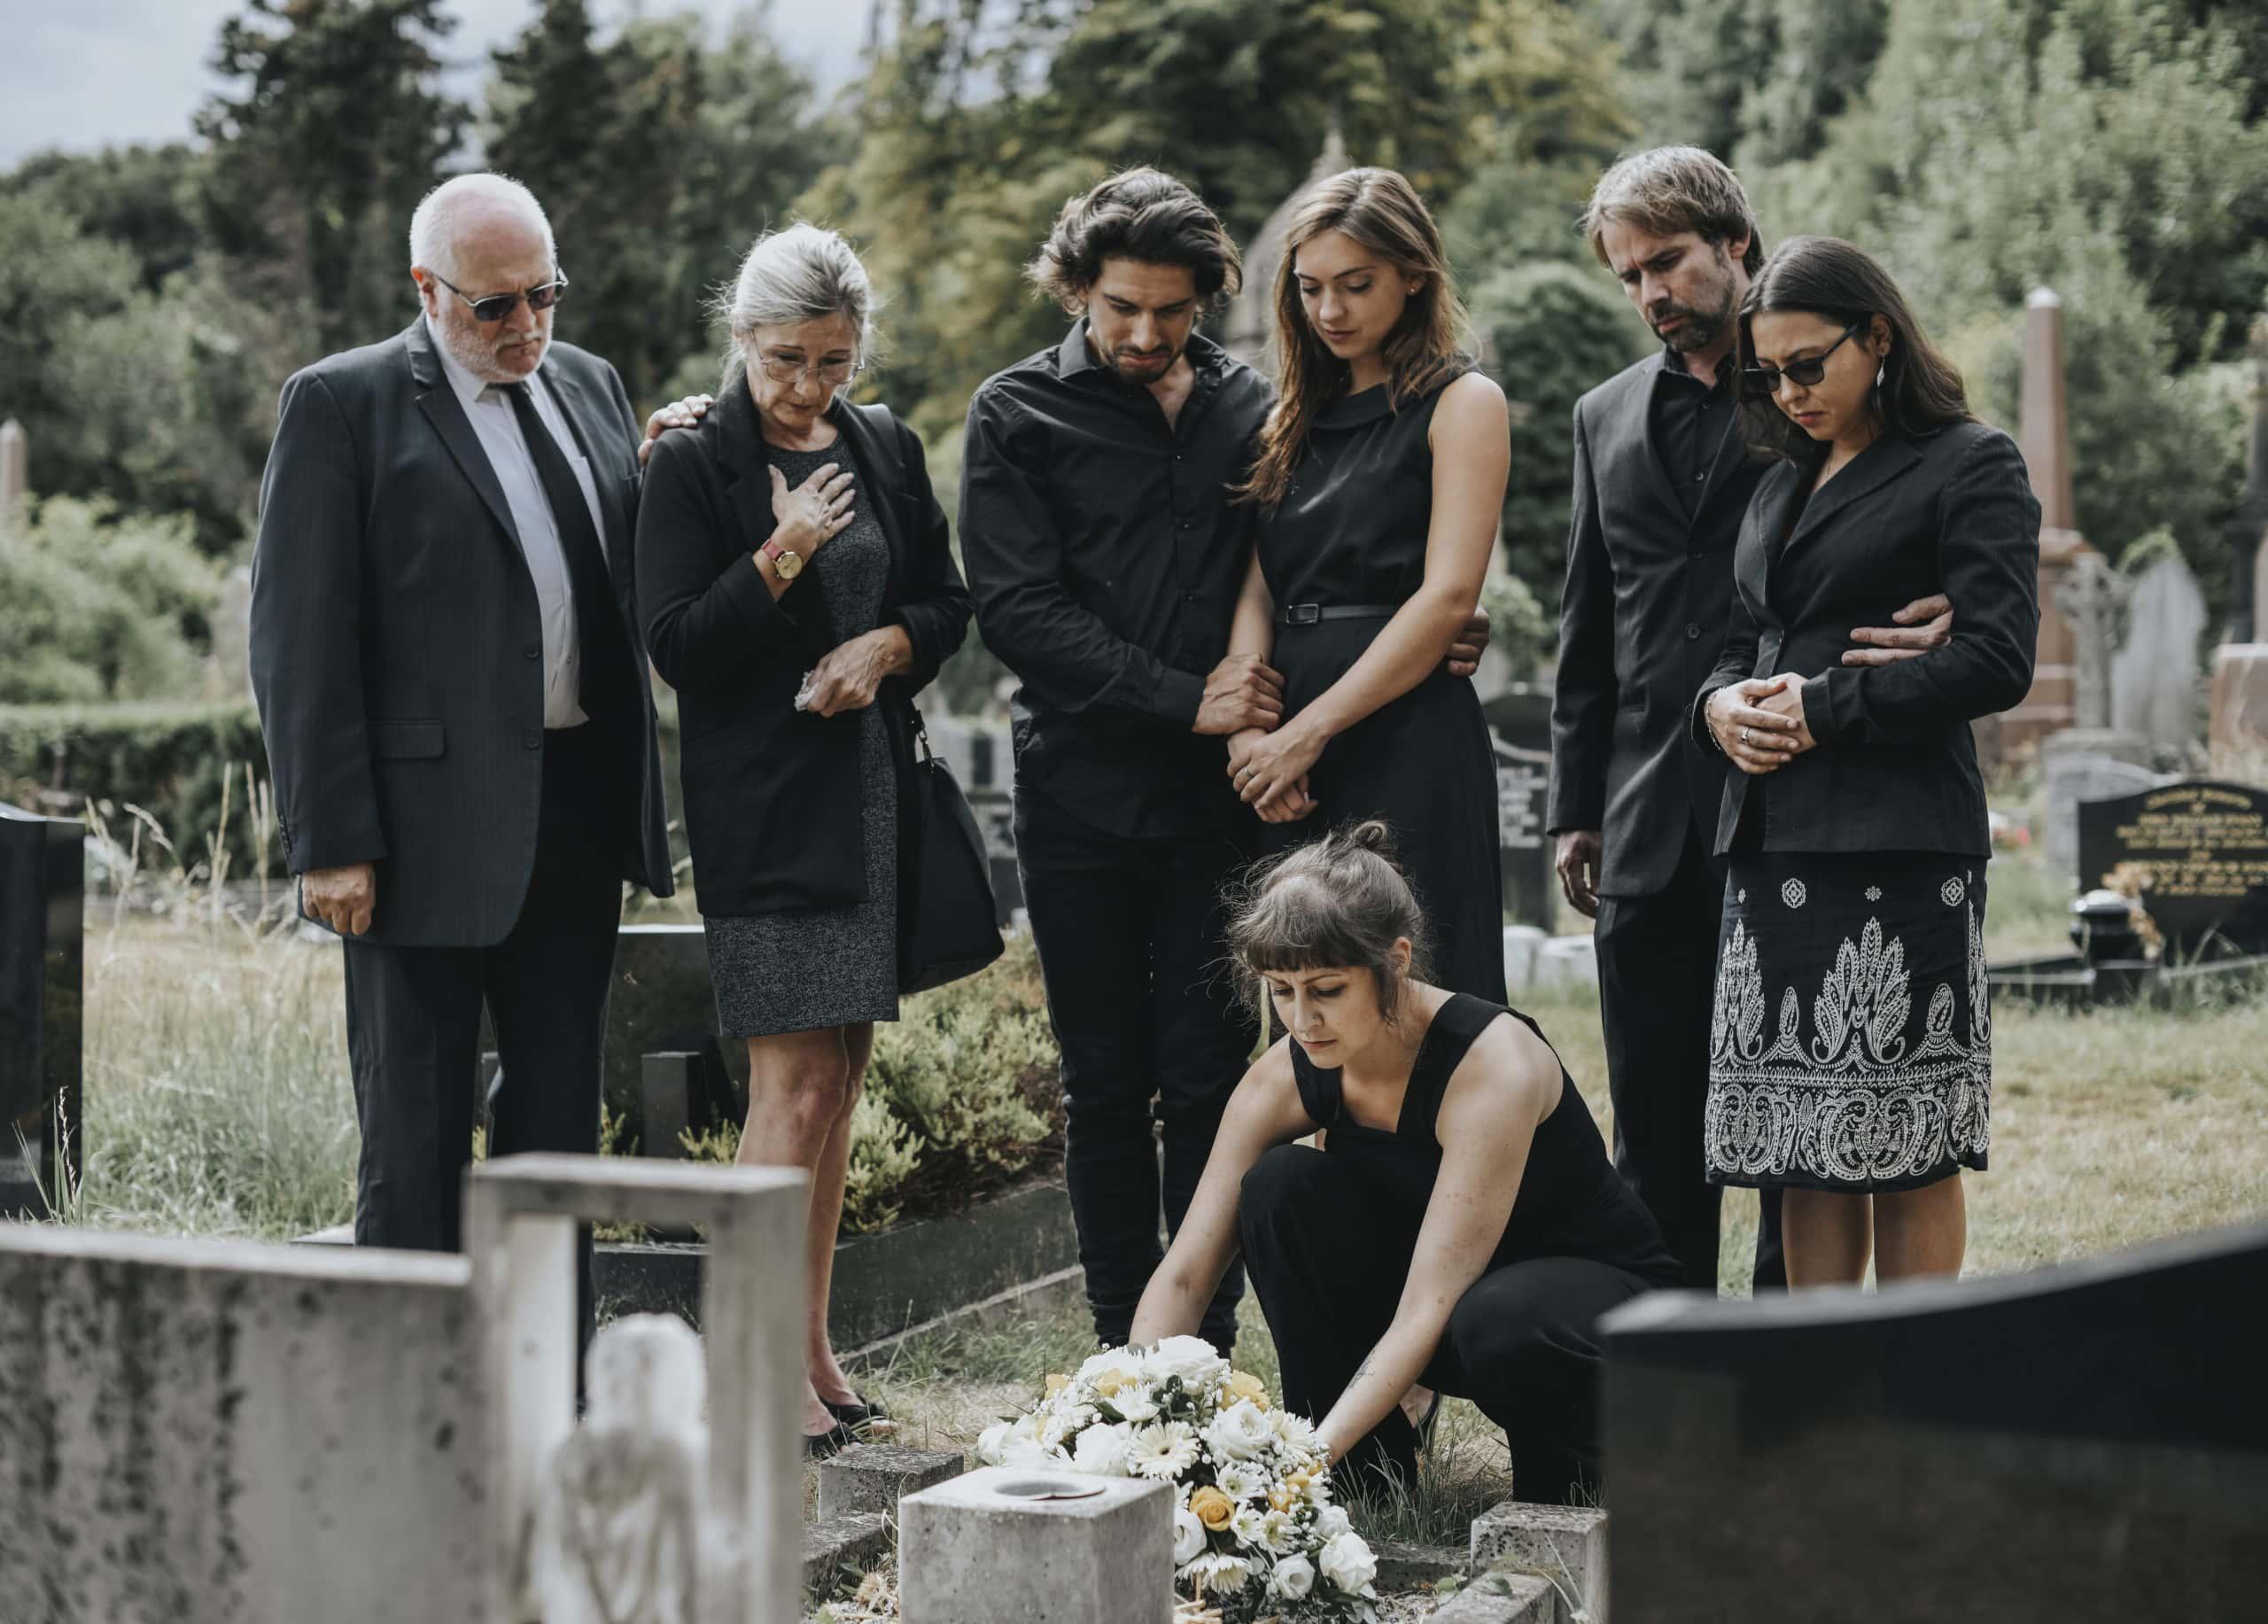 covid-19 funeral